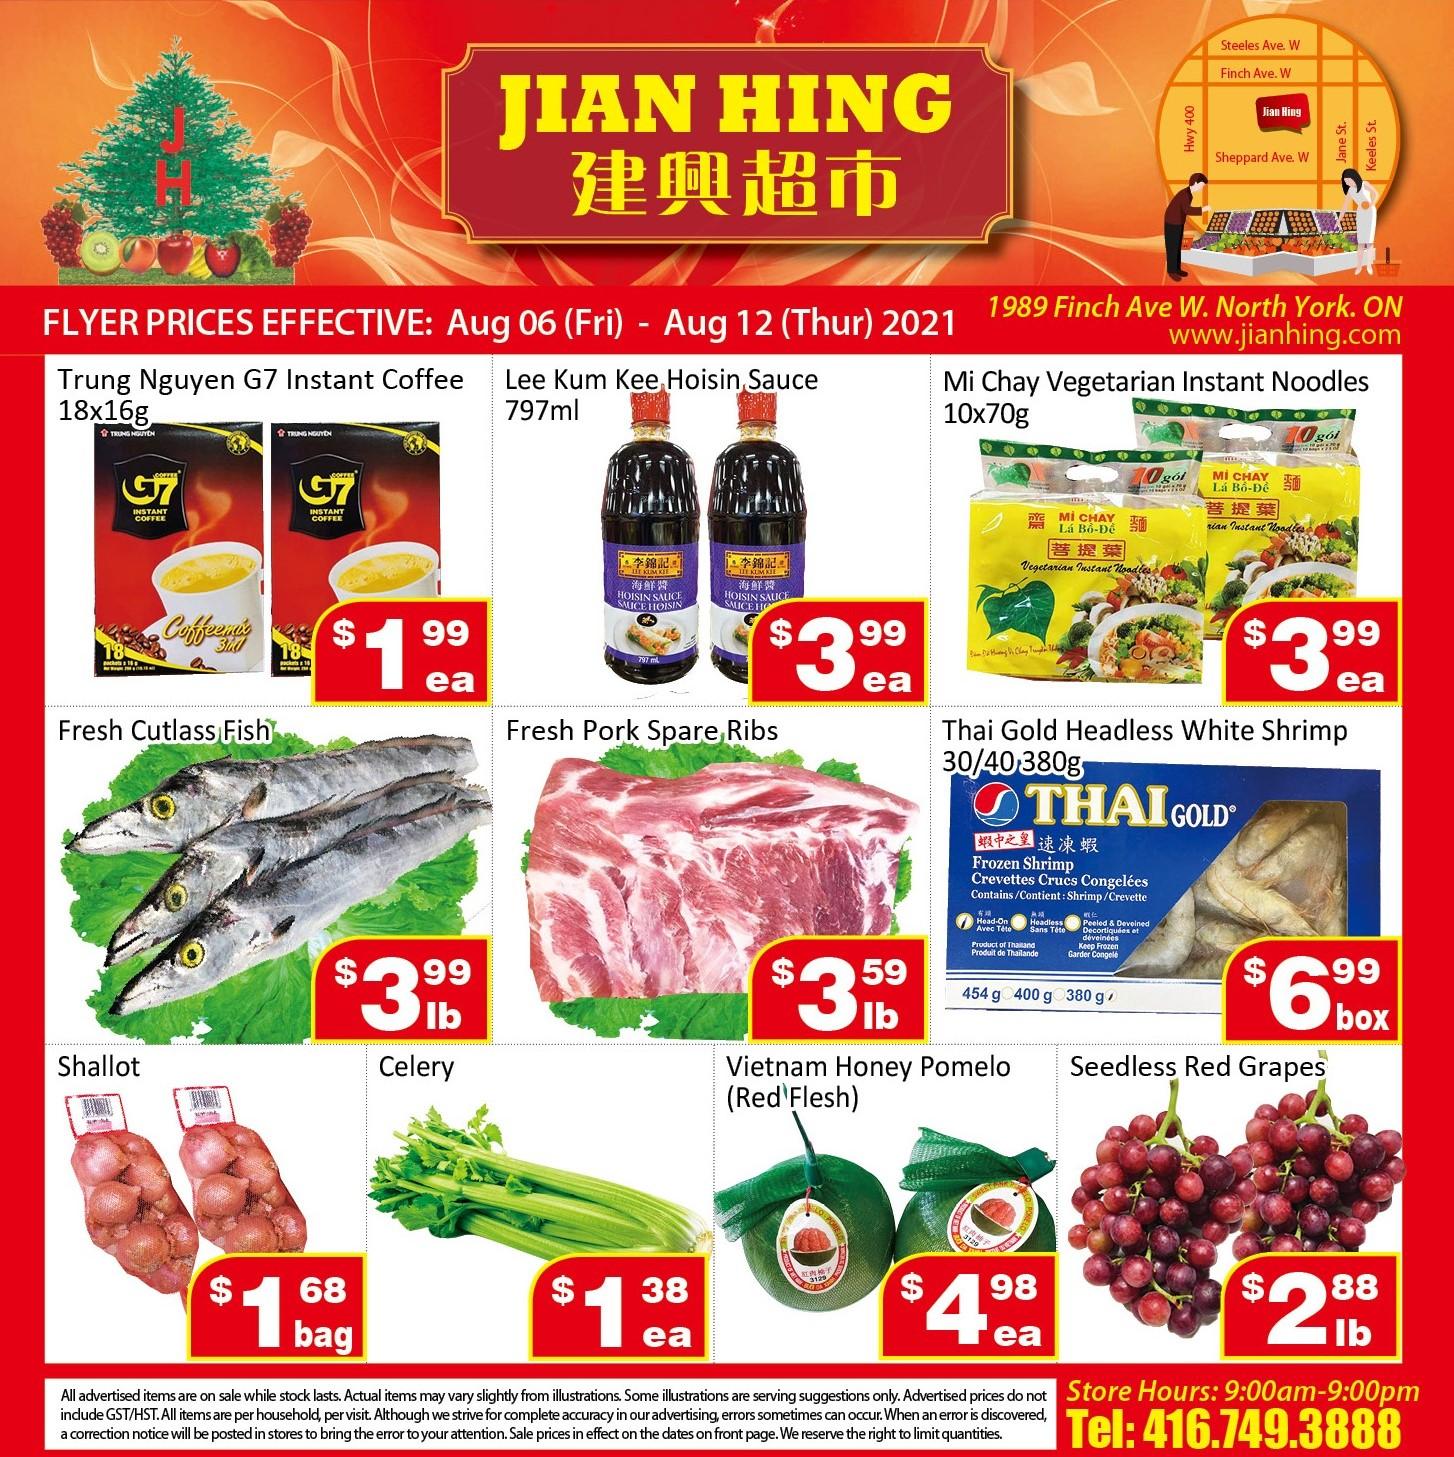 Jian Hing Supermarket Northyork Flyer | Aug 6